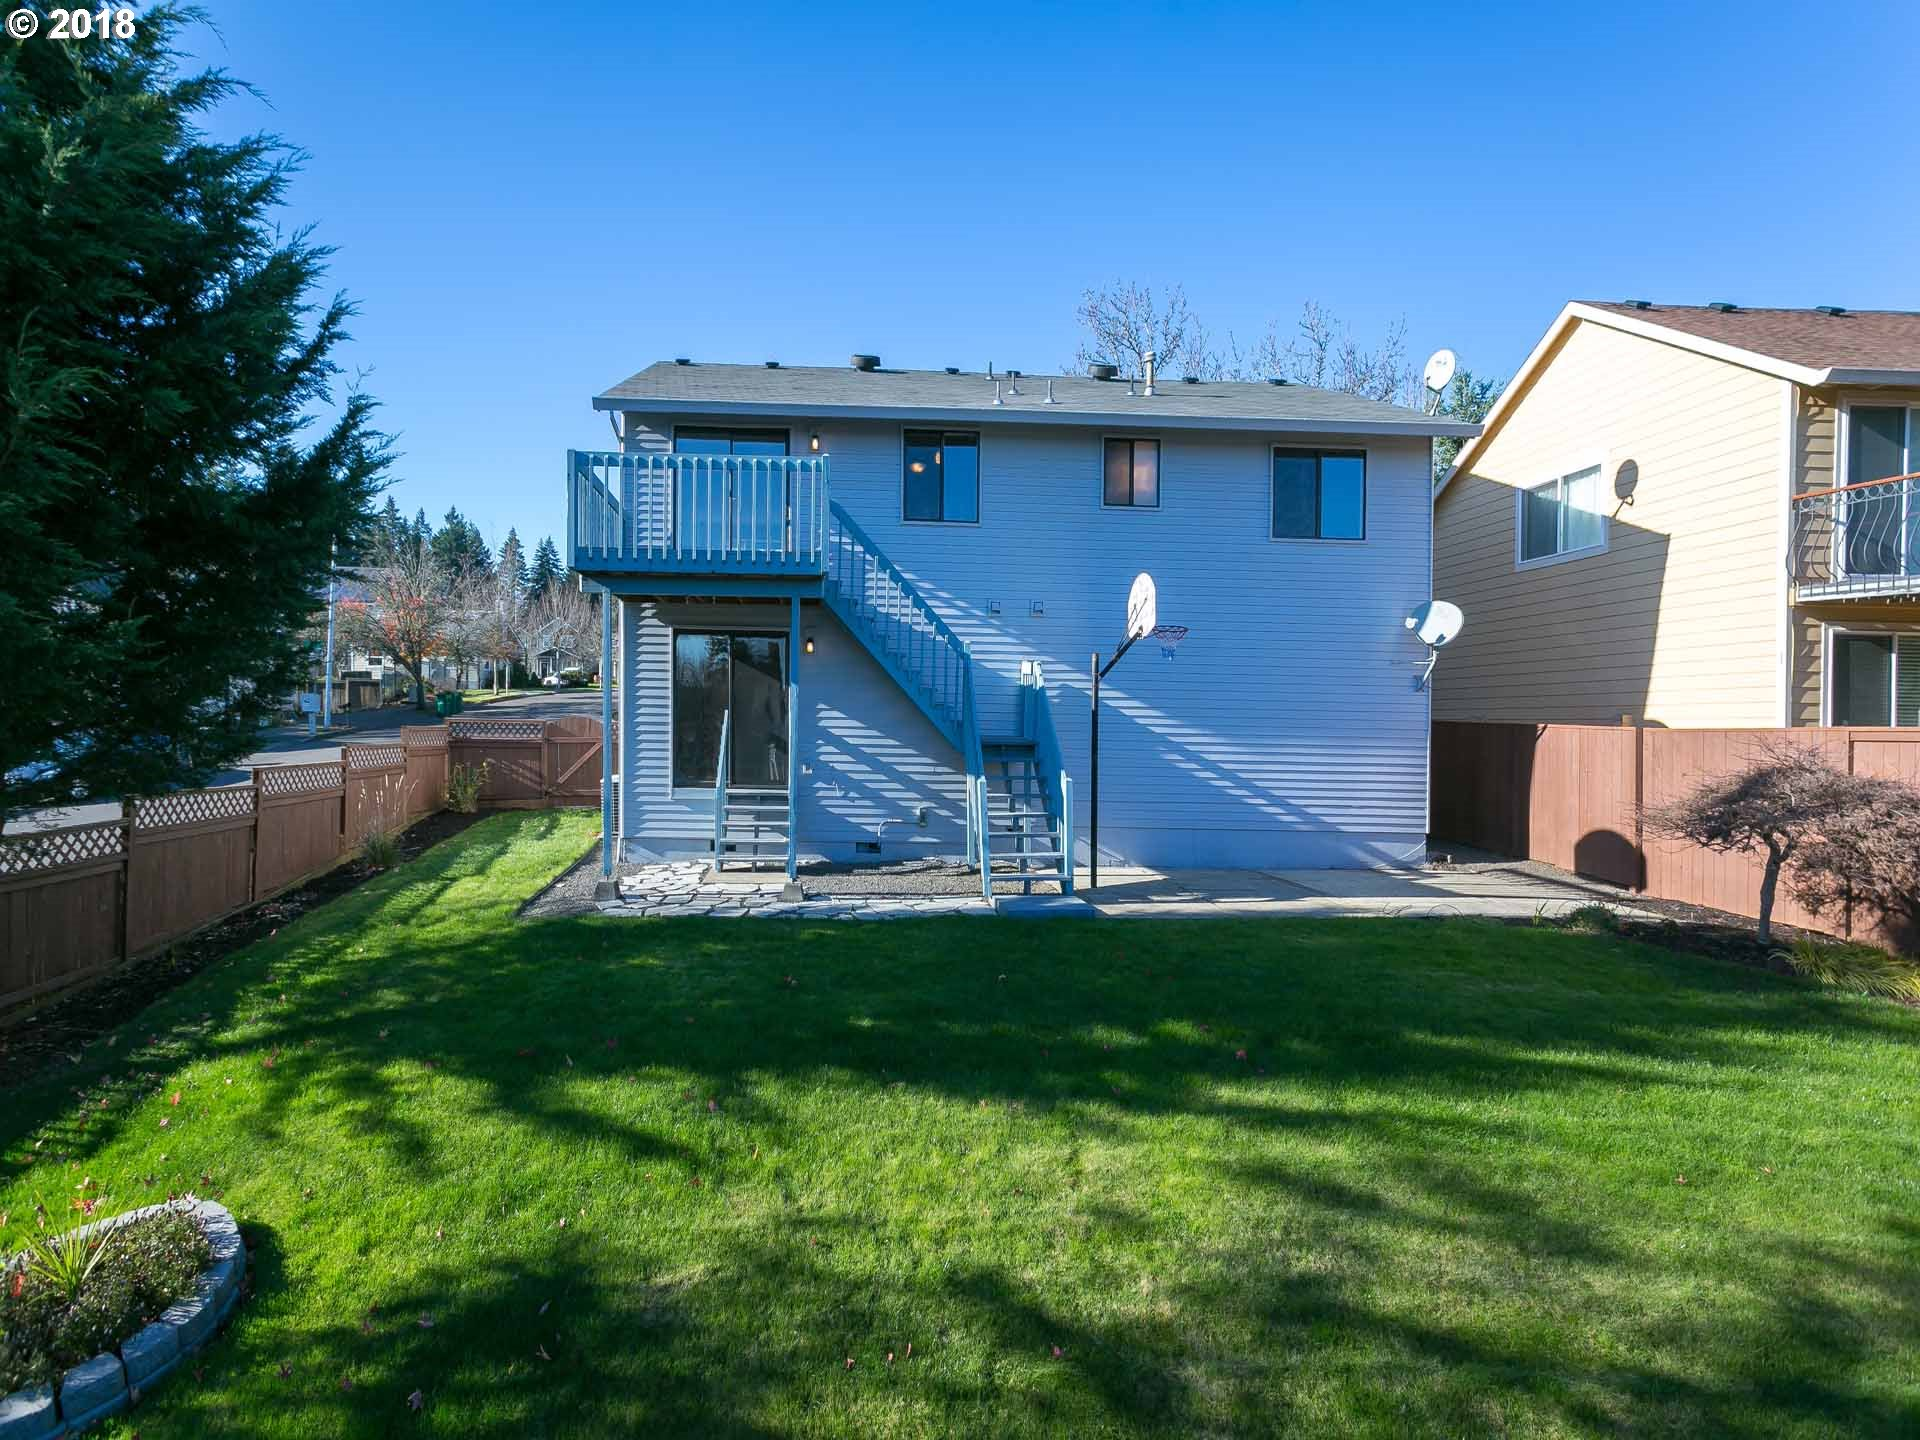 7780 SW VERONICA PL Beaverton, OR 97008 - MLS #: 18261980